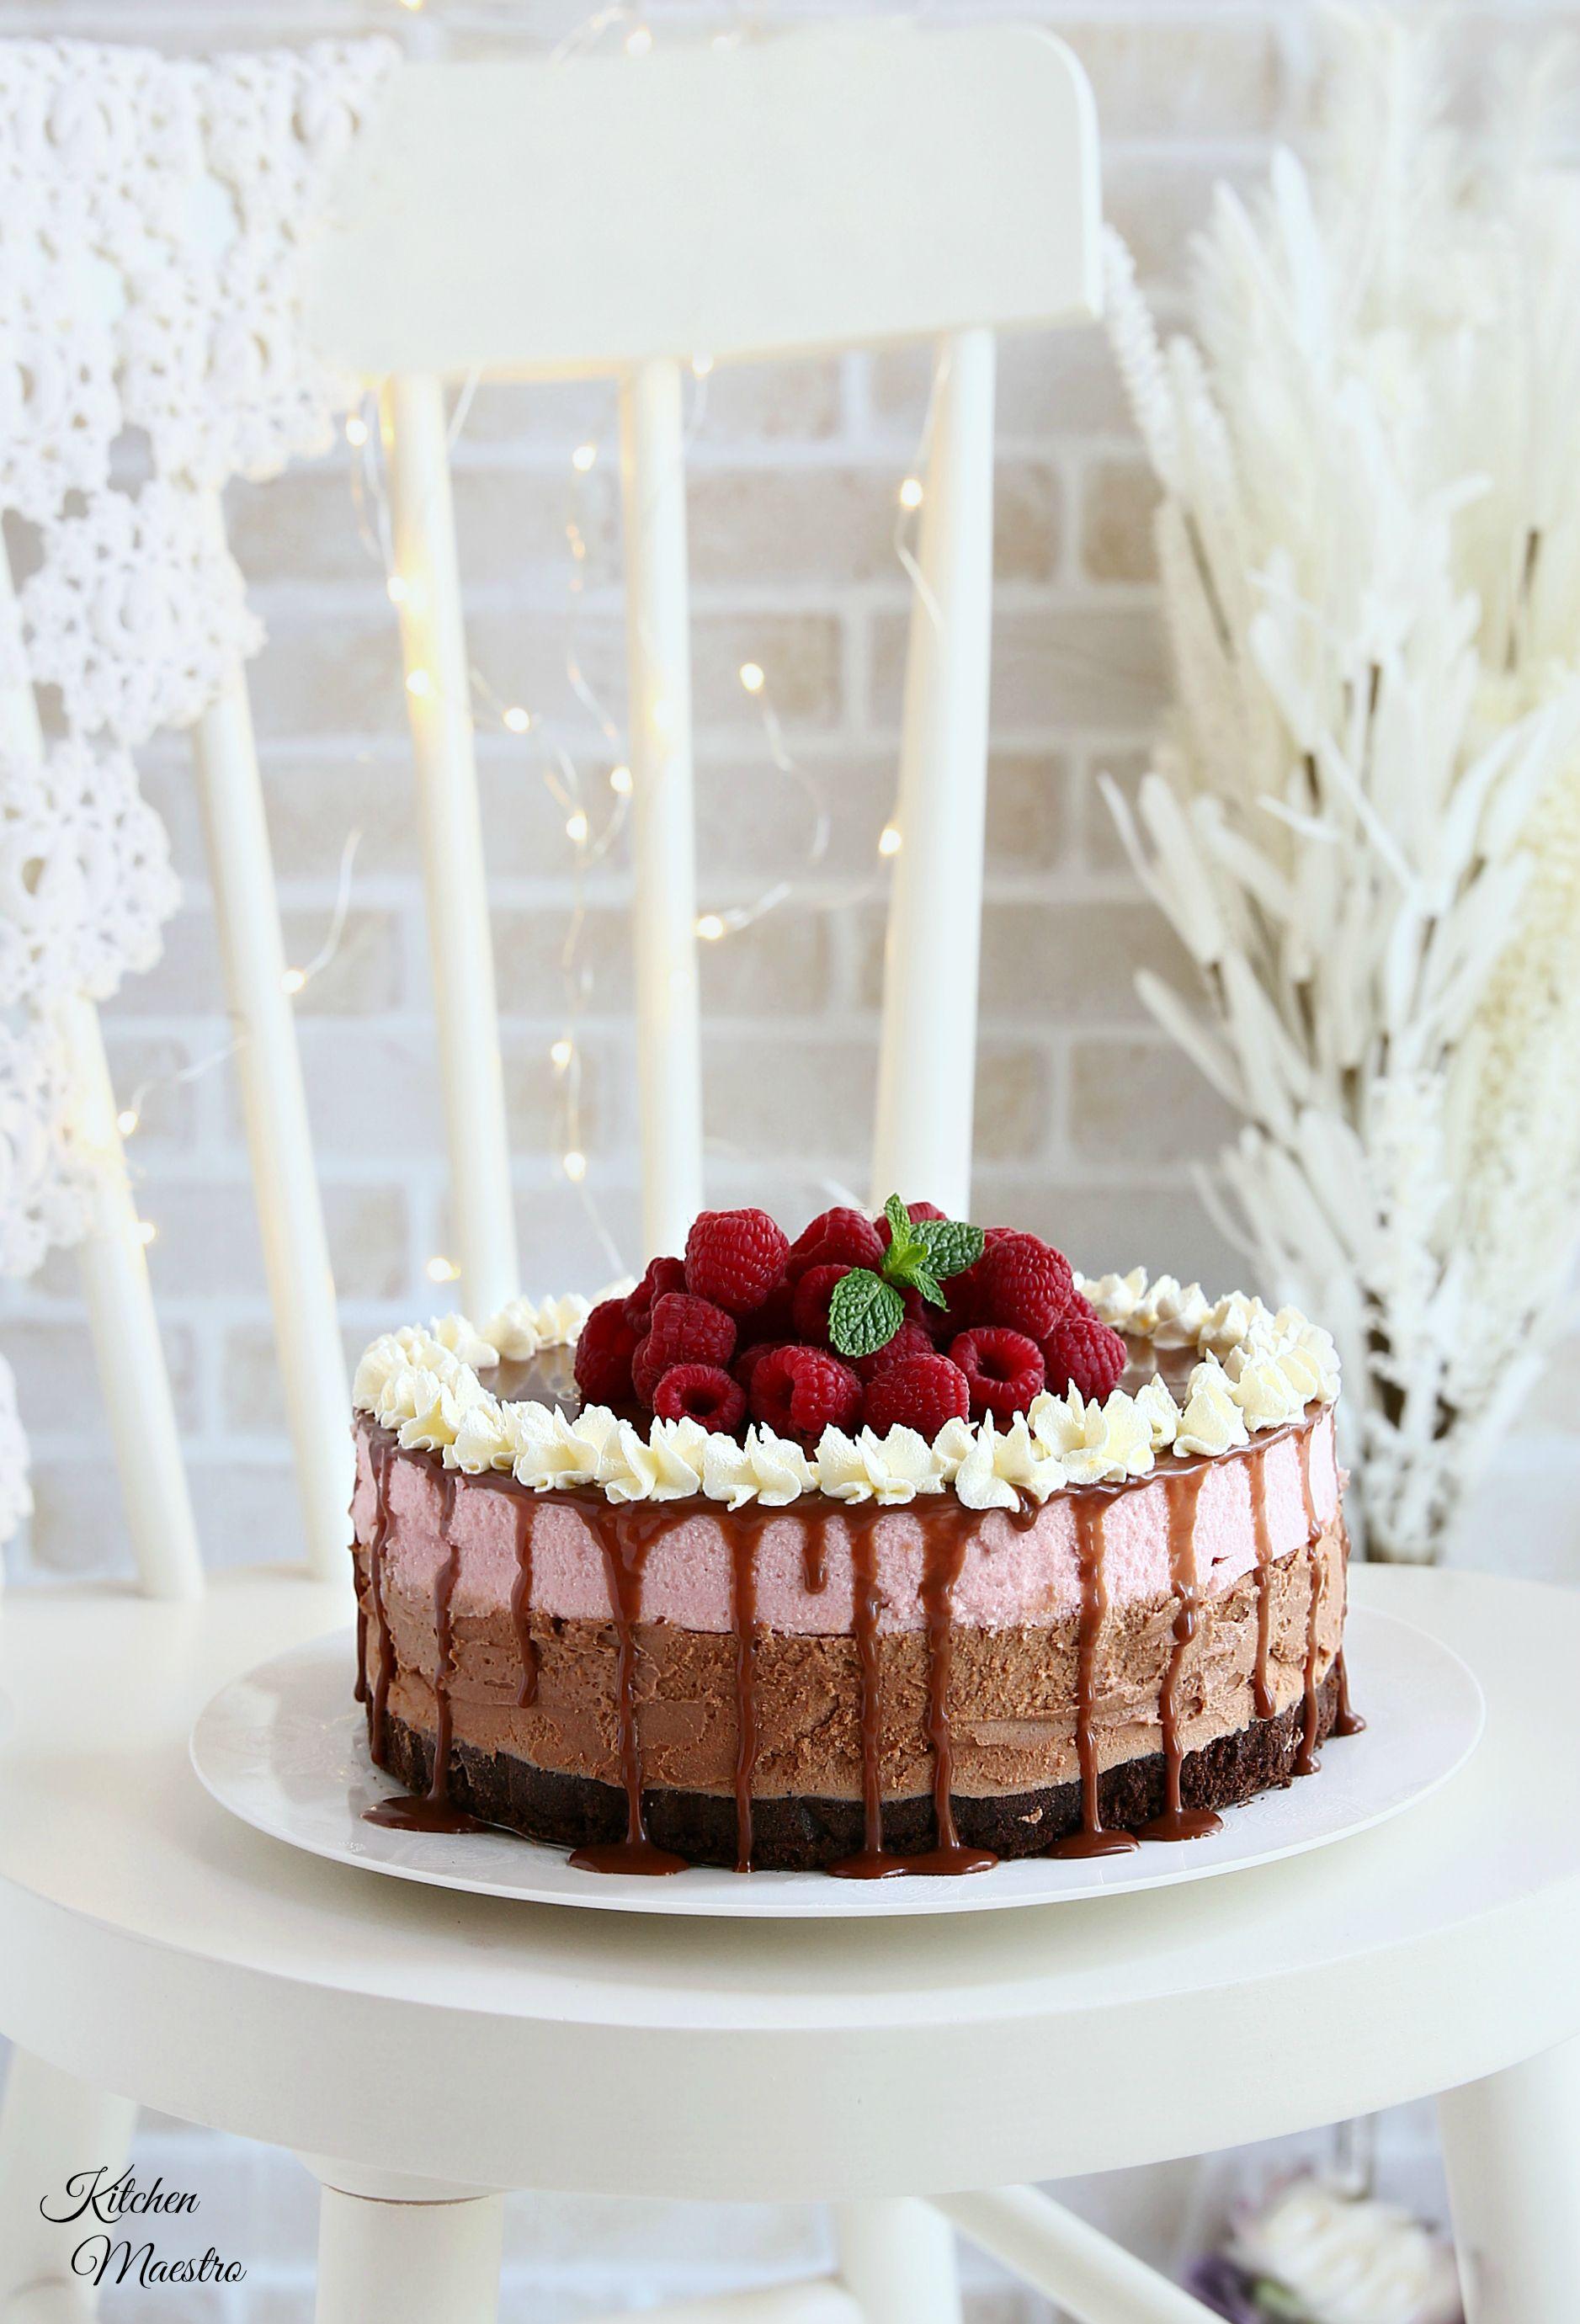 Chocolate Raspberry Mousse Cake Chocolate Raspberry Mousse Cake Raspberry Mousse Cake Arabic Dessert